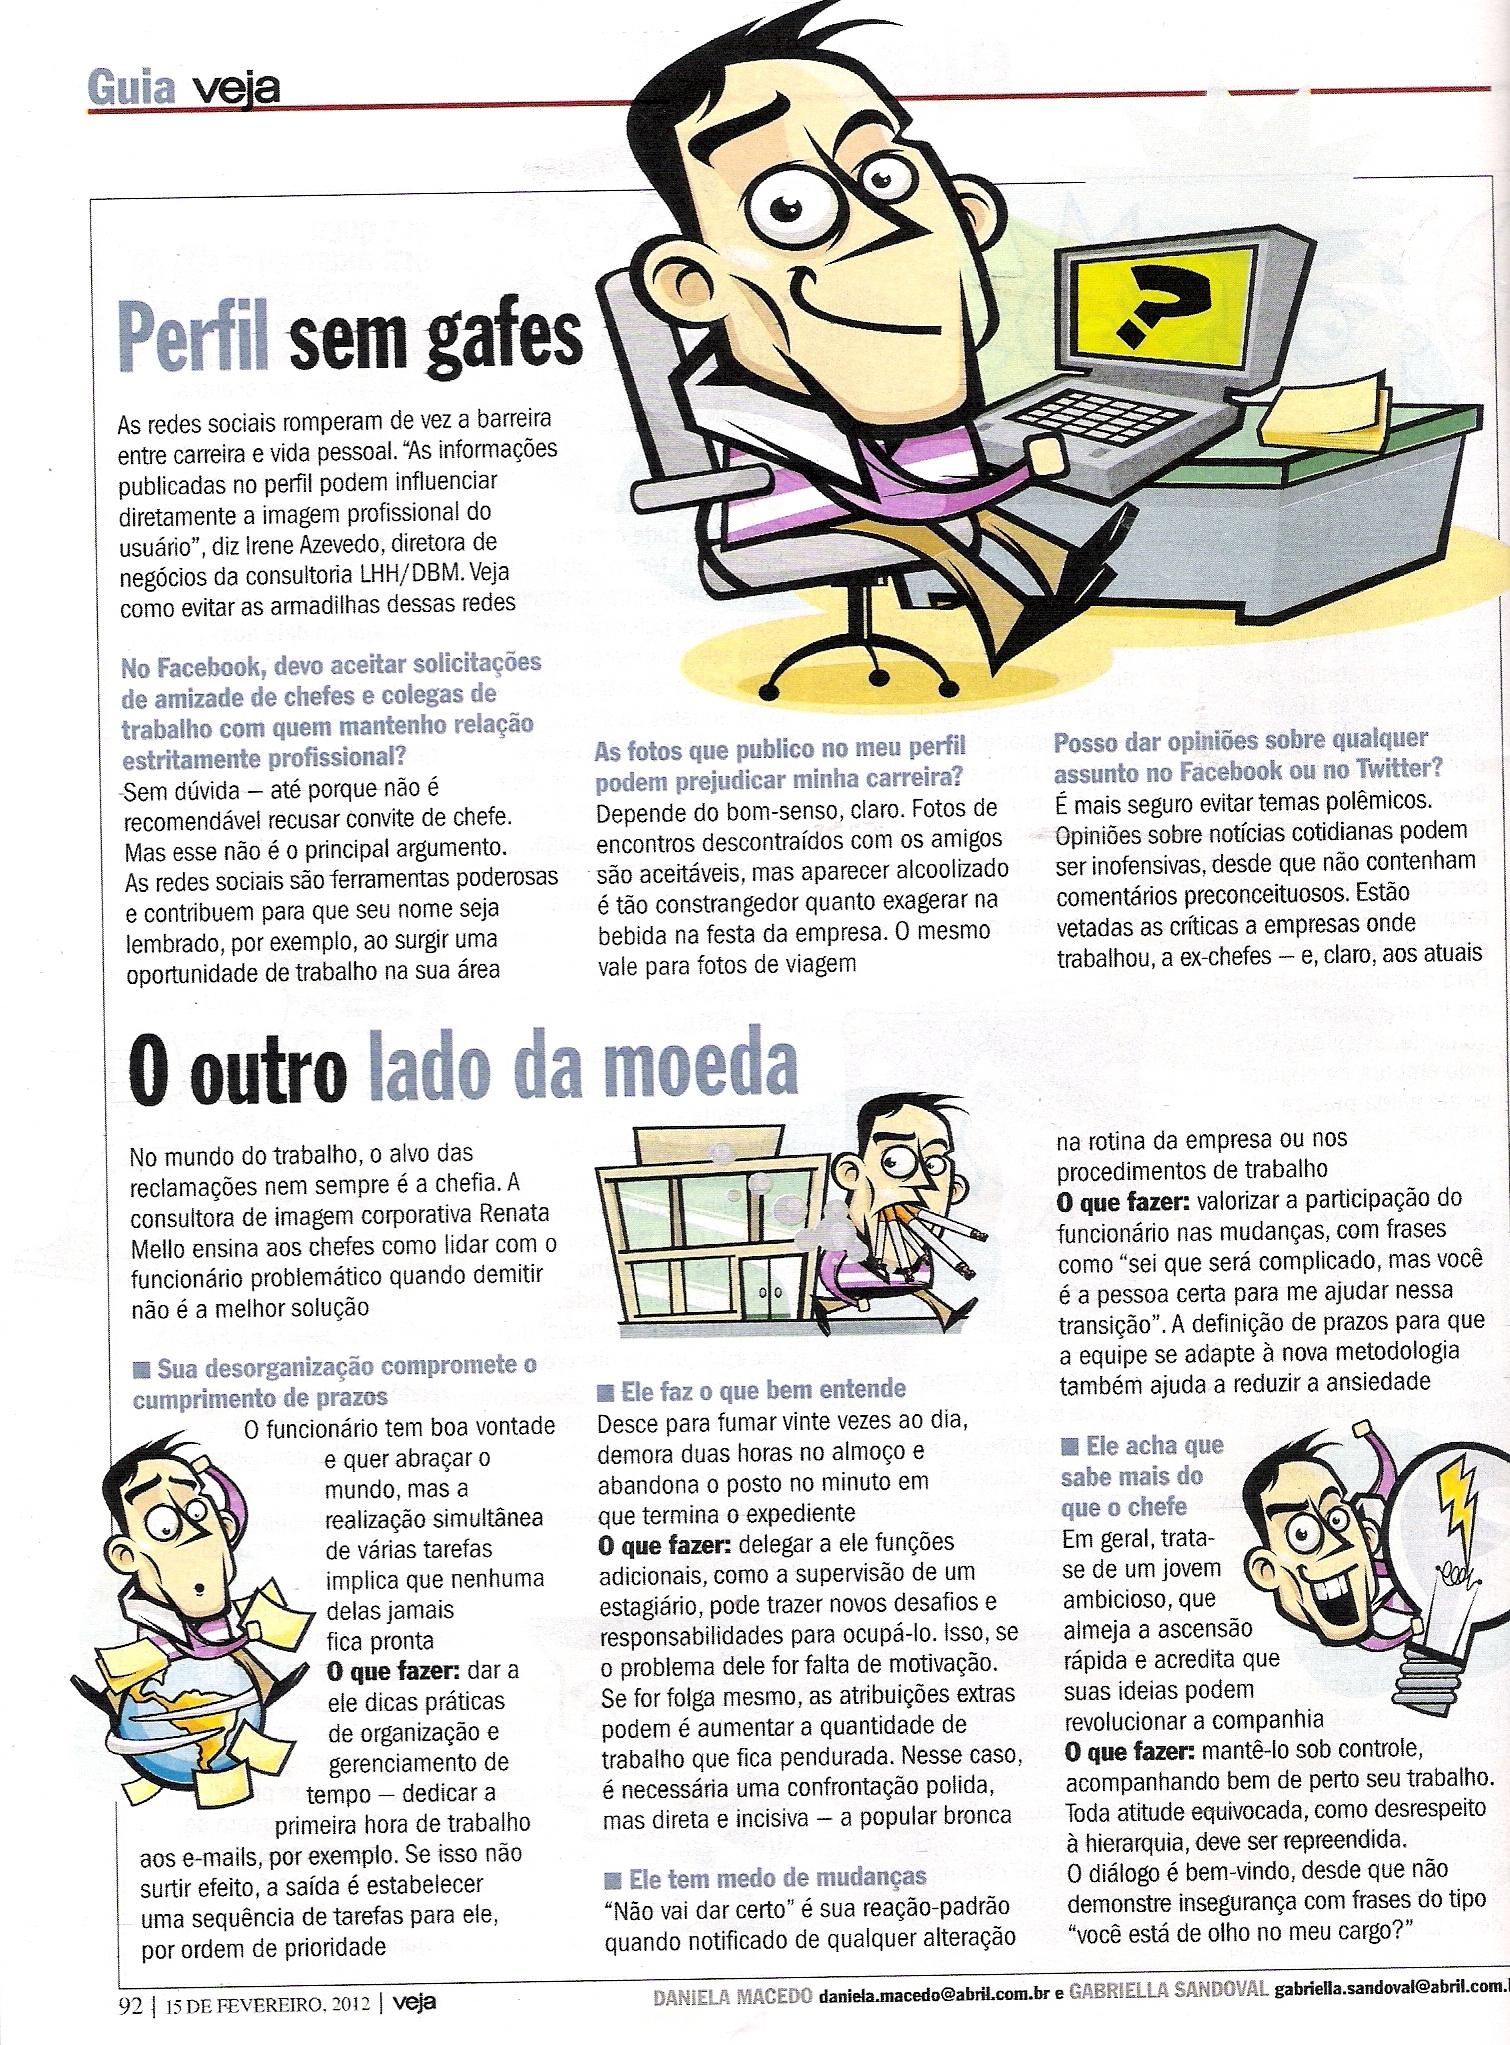 15/02/12 Revista Veja